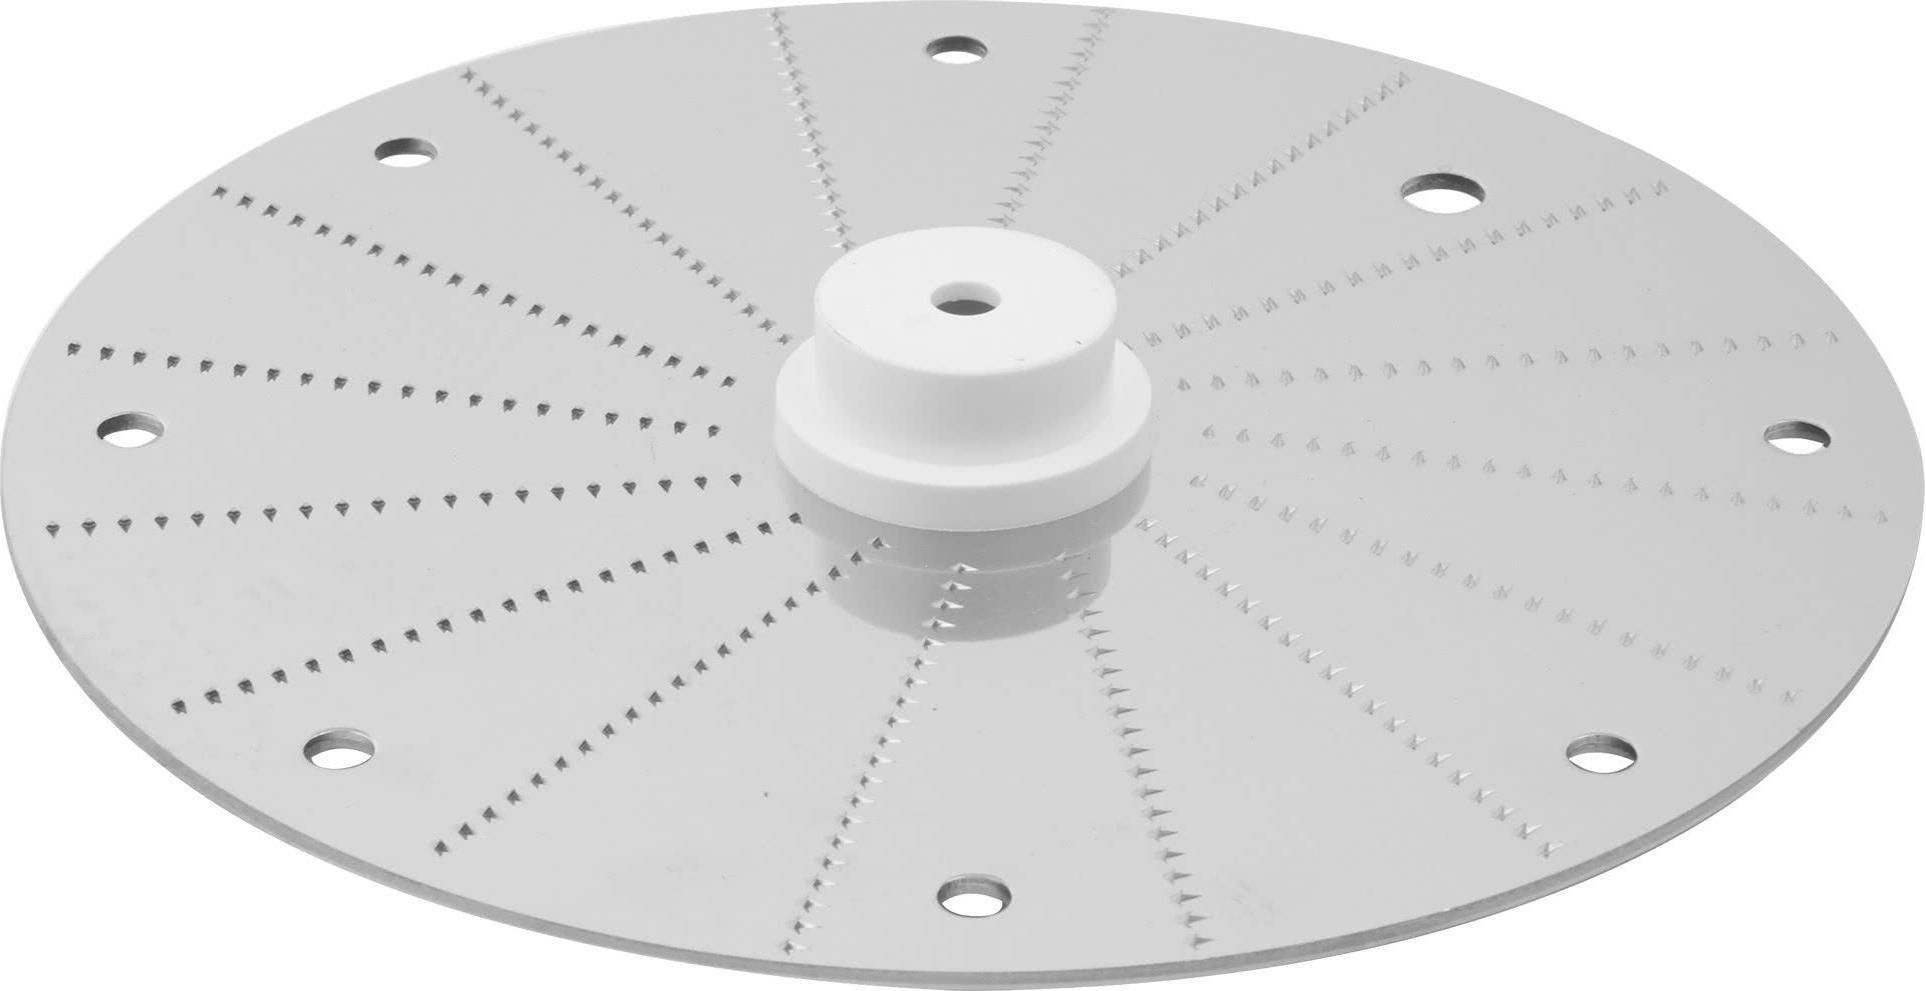 Диск-тёрка Robot Coupe 27078(0,7мм) для редьки и хрена - 2